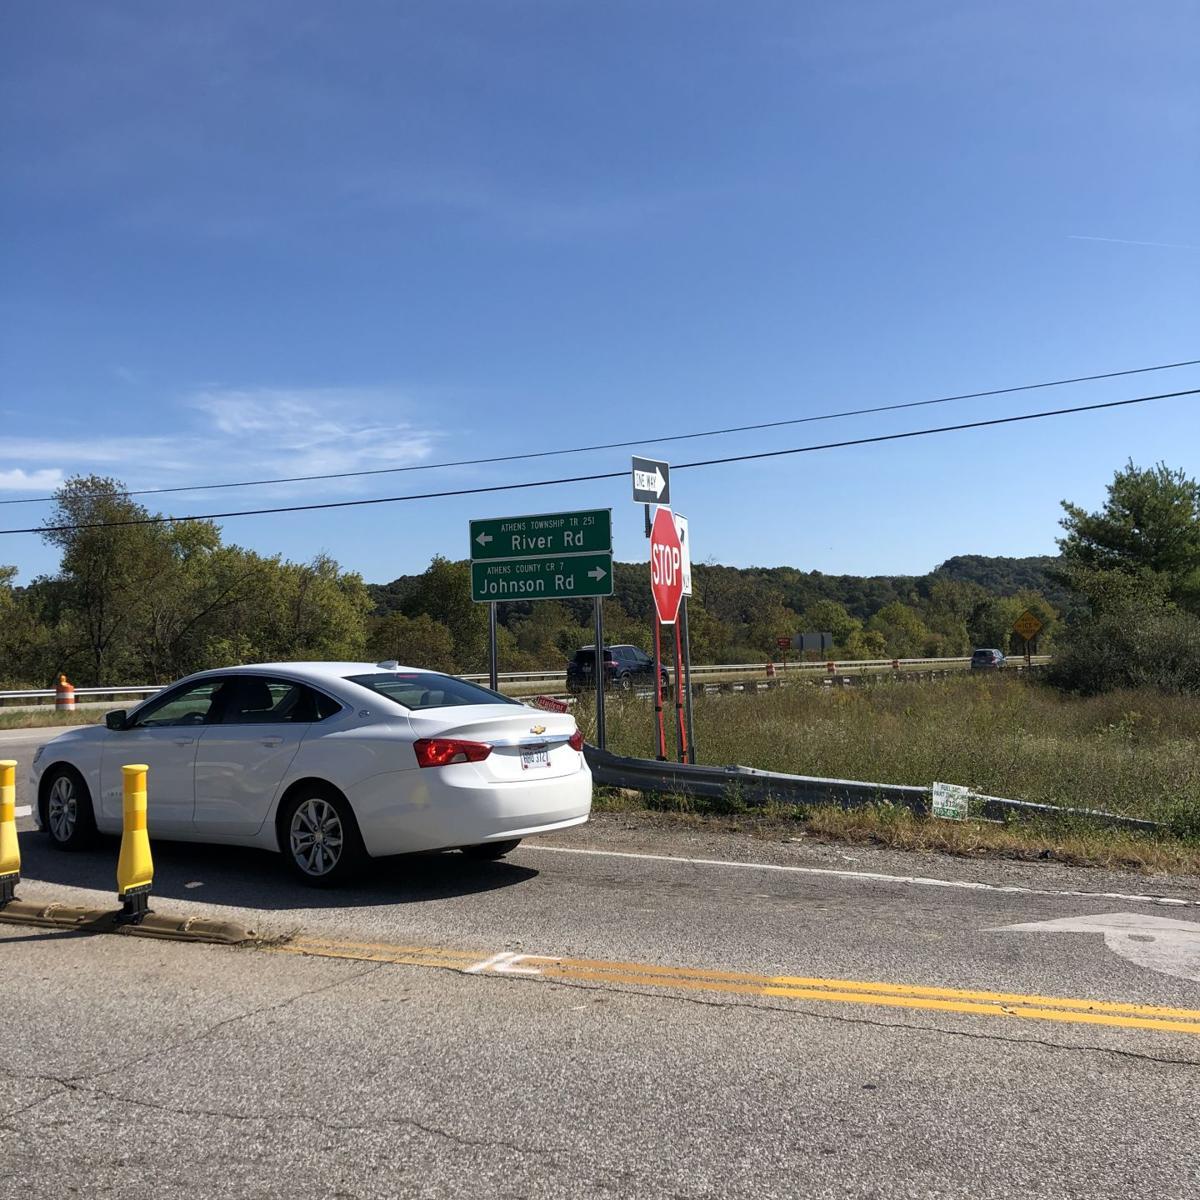 Johnson road - rt. 33